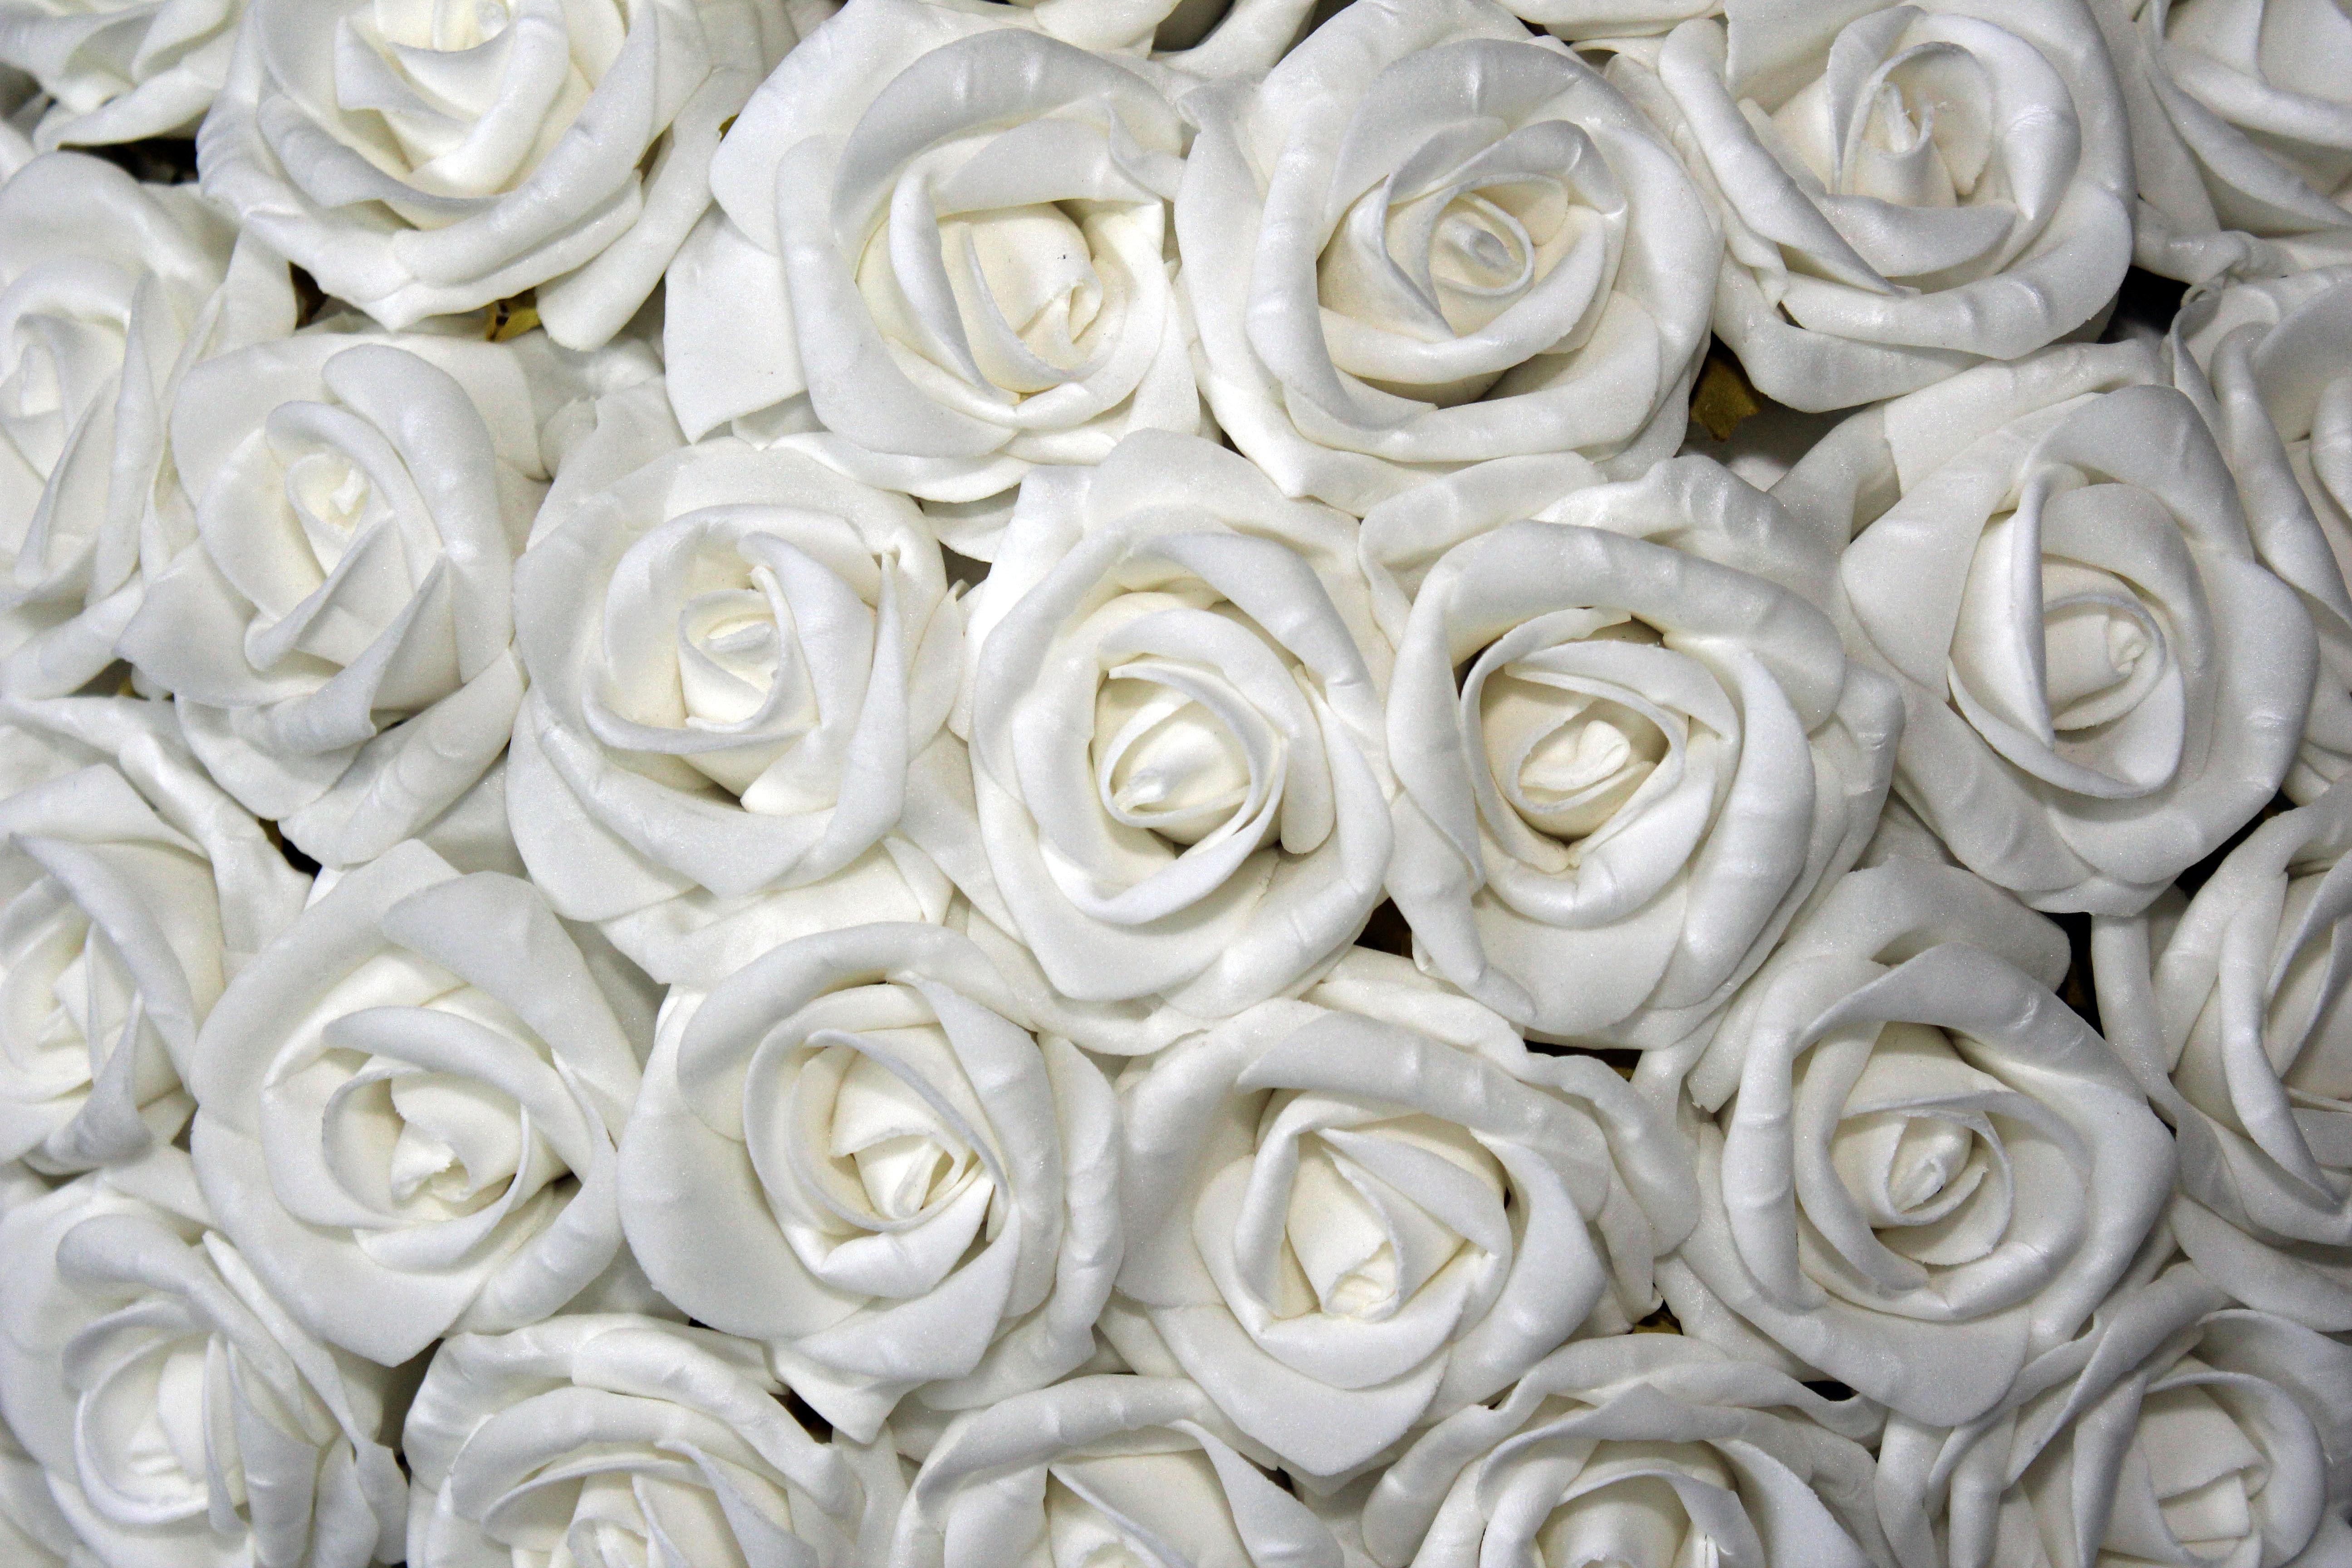 Free images white petal rose dish food flowers icing floral plant white flower petal rose dish food flowers roses icing floral arrangement table decoration flowering plant mightylinksfo